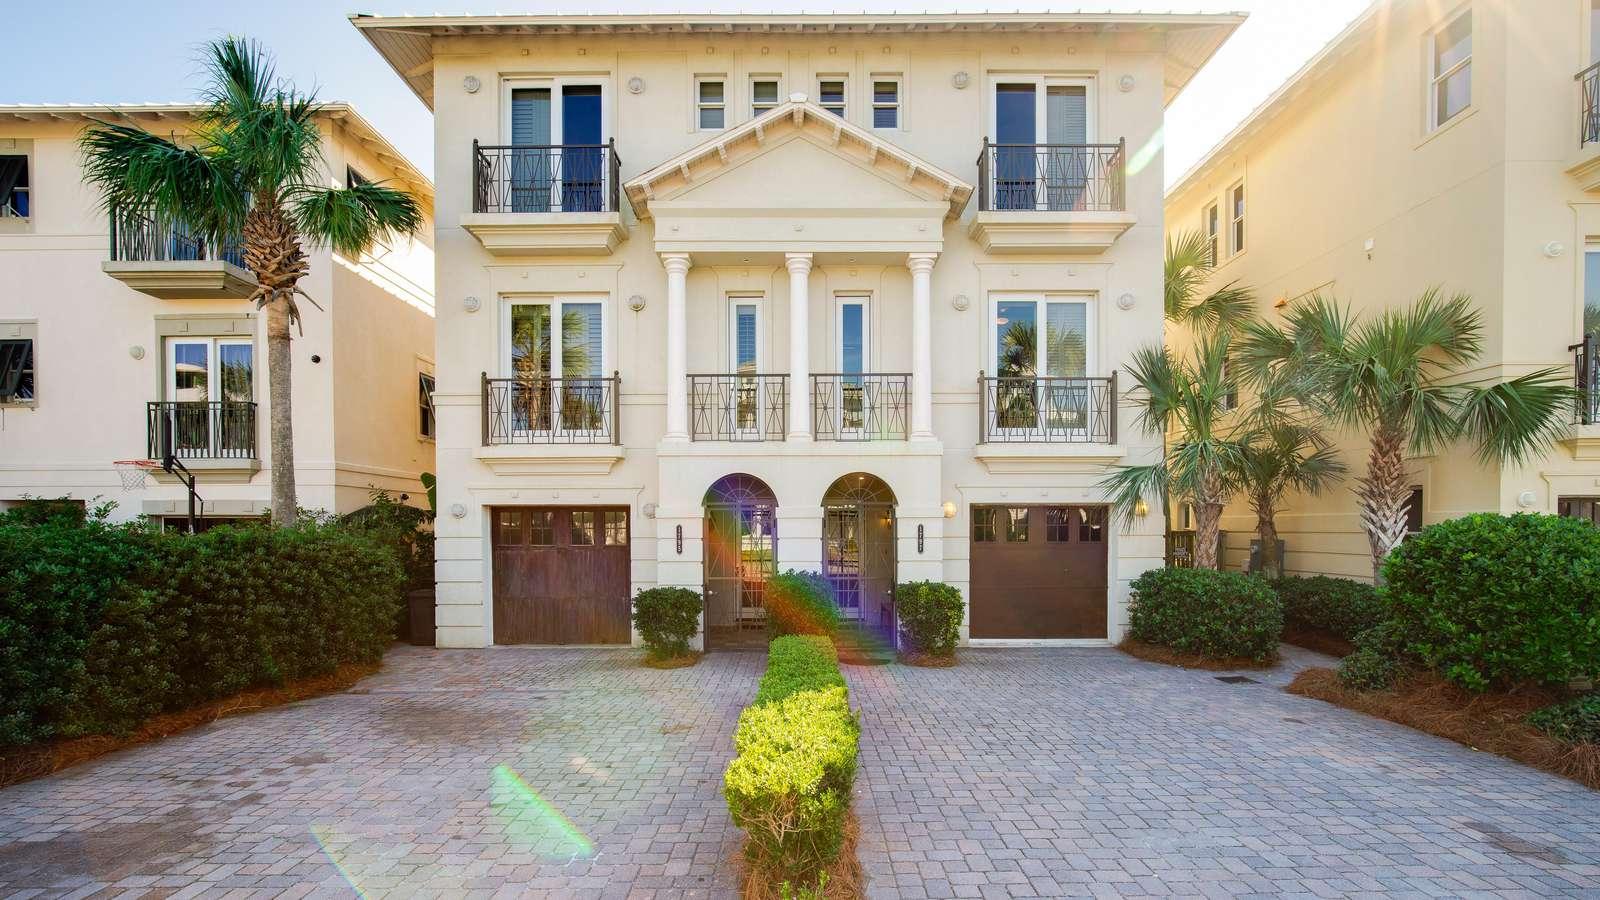 Enjoy the beauty of Emerald Embrace Beach House!